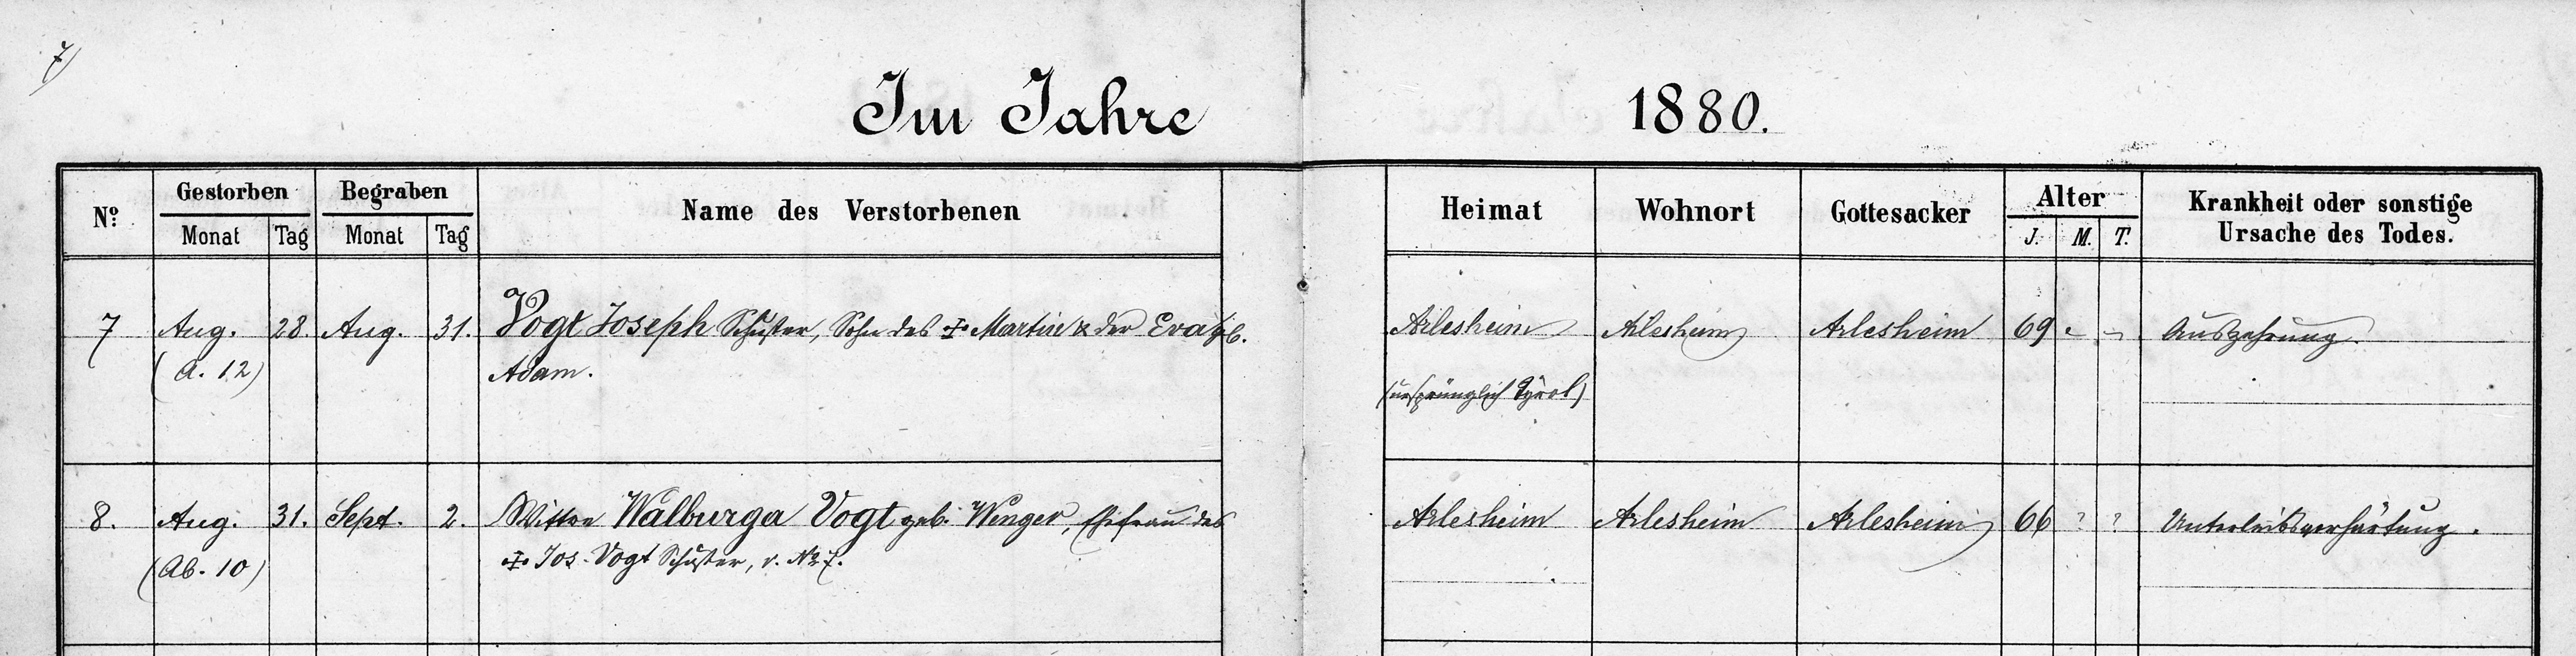 Walburga Vogt-Wenger (Tod 1880 in Arlesheim)